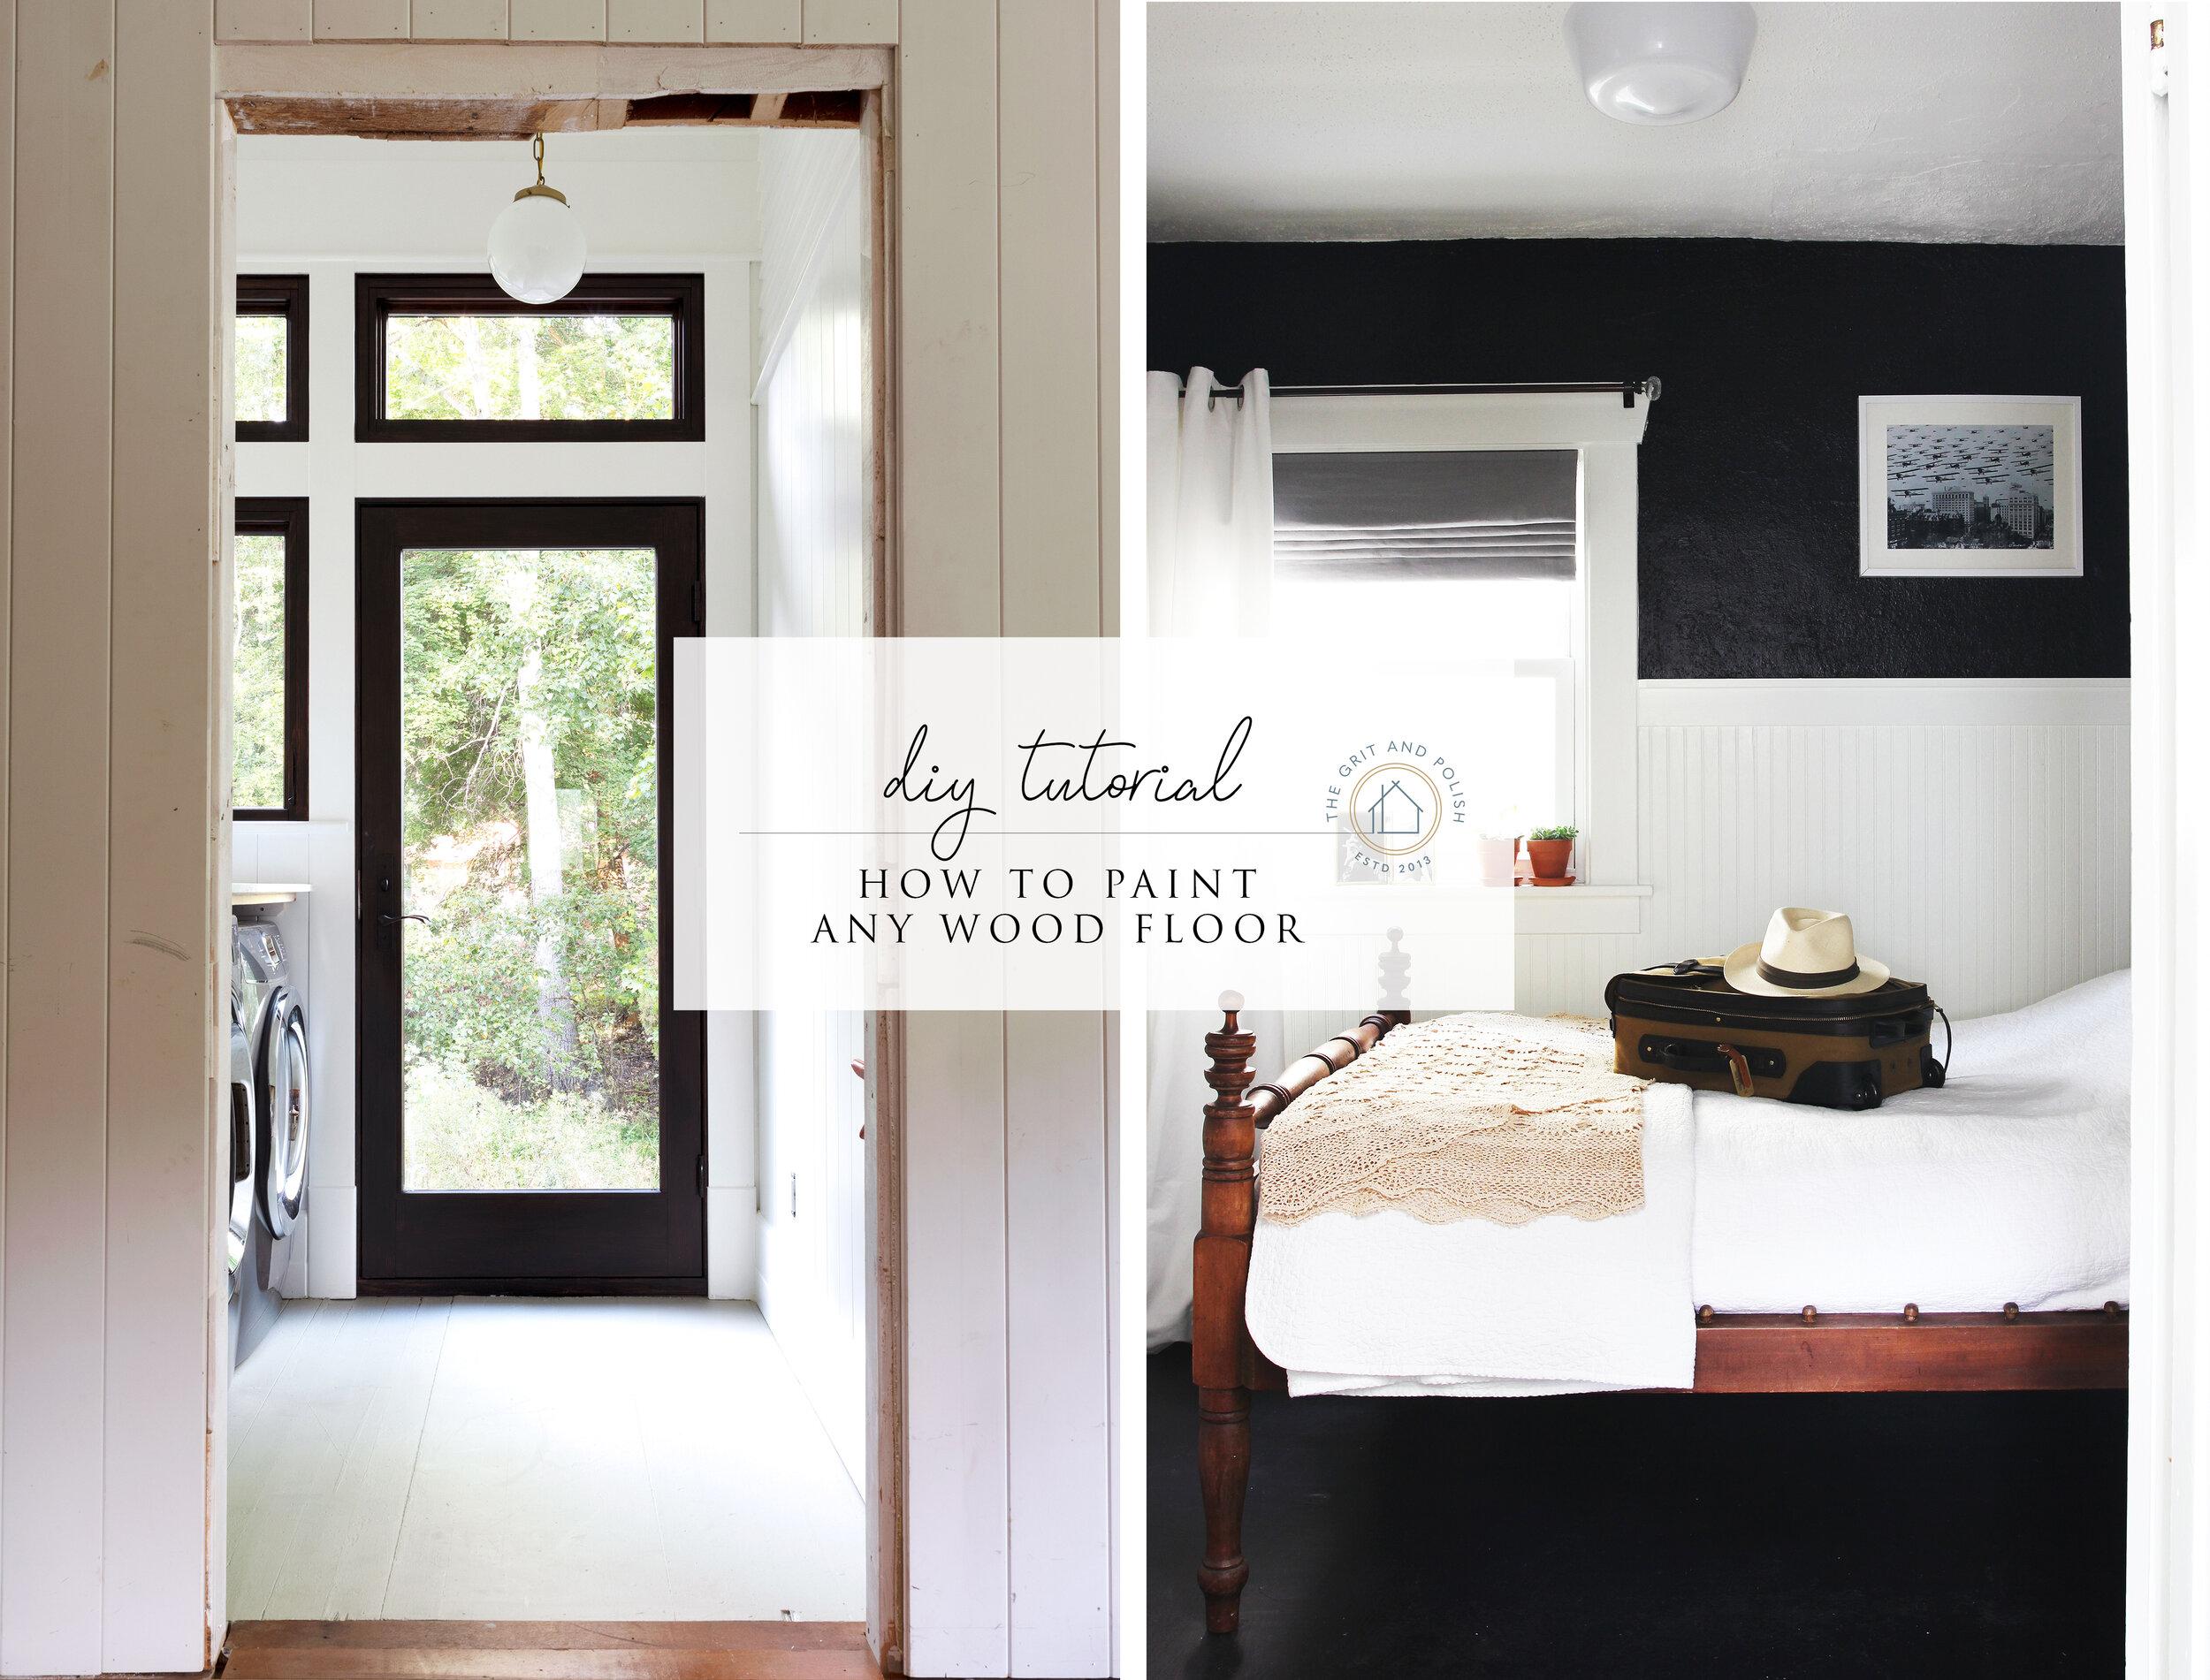 The Grit and Polish - DIY How To Paint Wood Floor.jpg